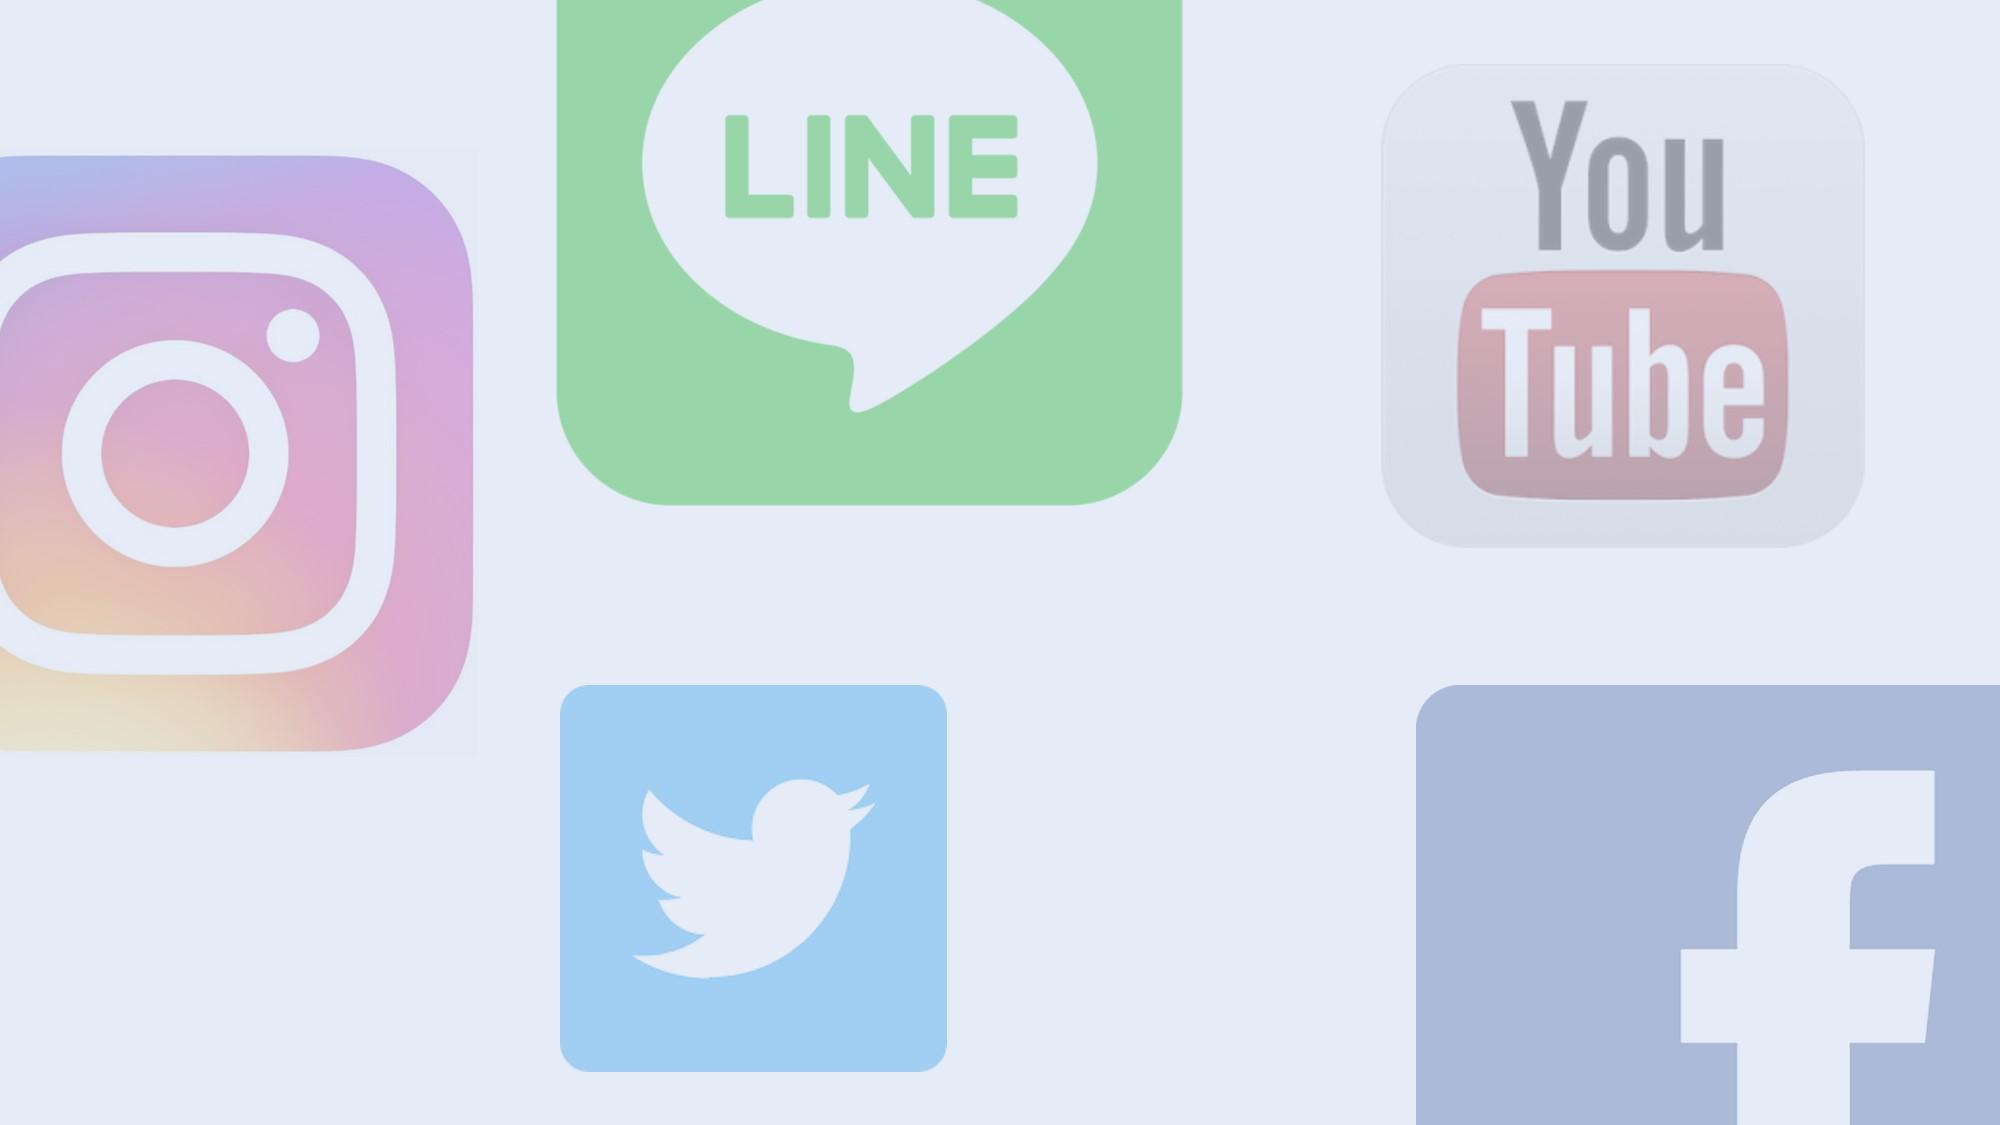 【Web初心者必見!】SNS・ブログ・YouTubeなど…、ネット集客は何から手を付けるべきか?